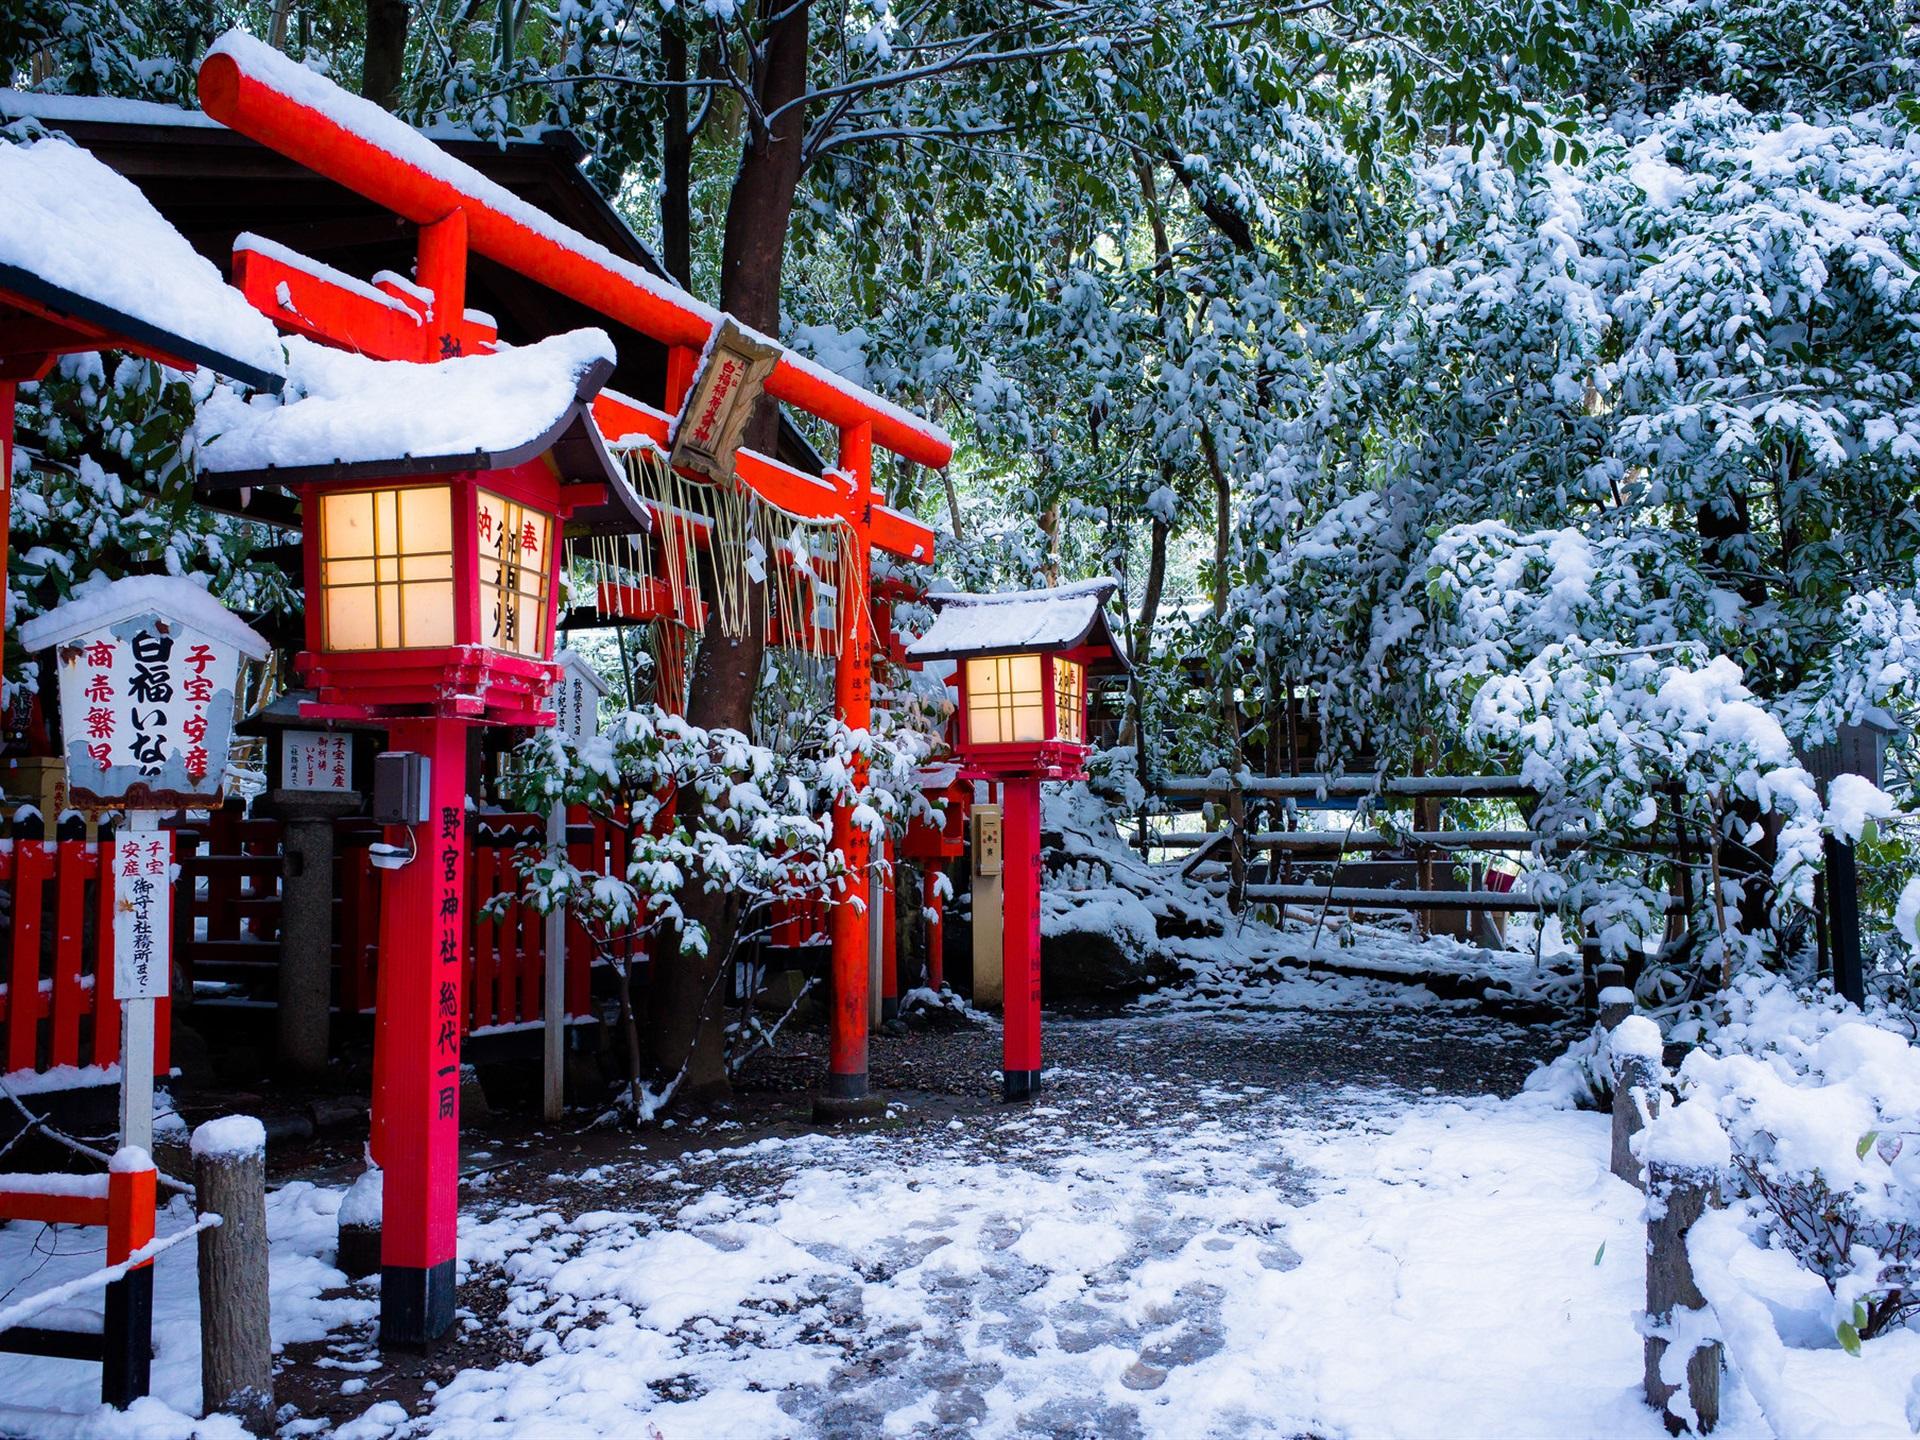 壁紙 神社 鳥居ゲート 京都 日本 冬 雪 木 1920x1440 Hd 無料の